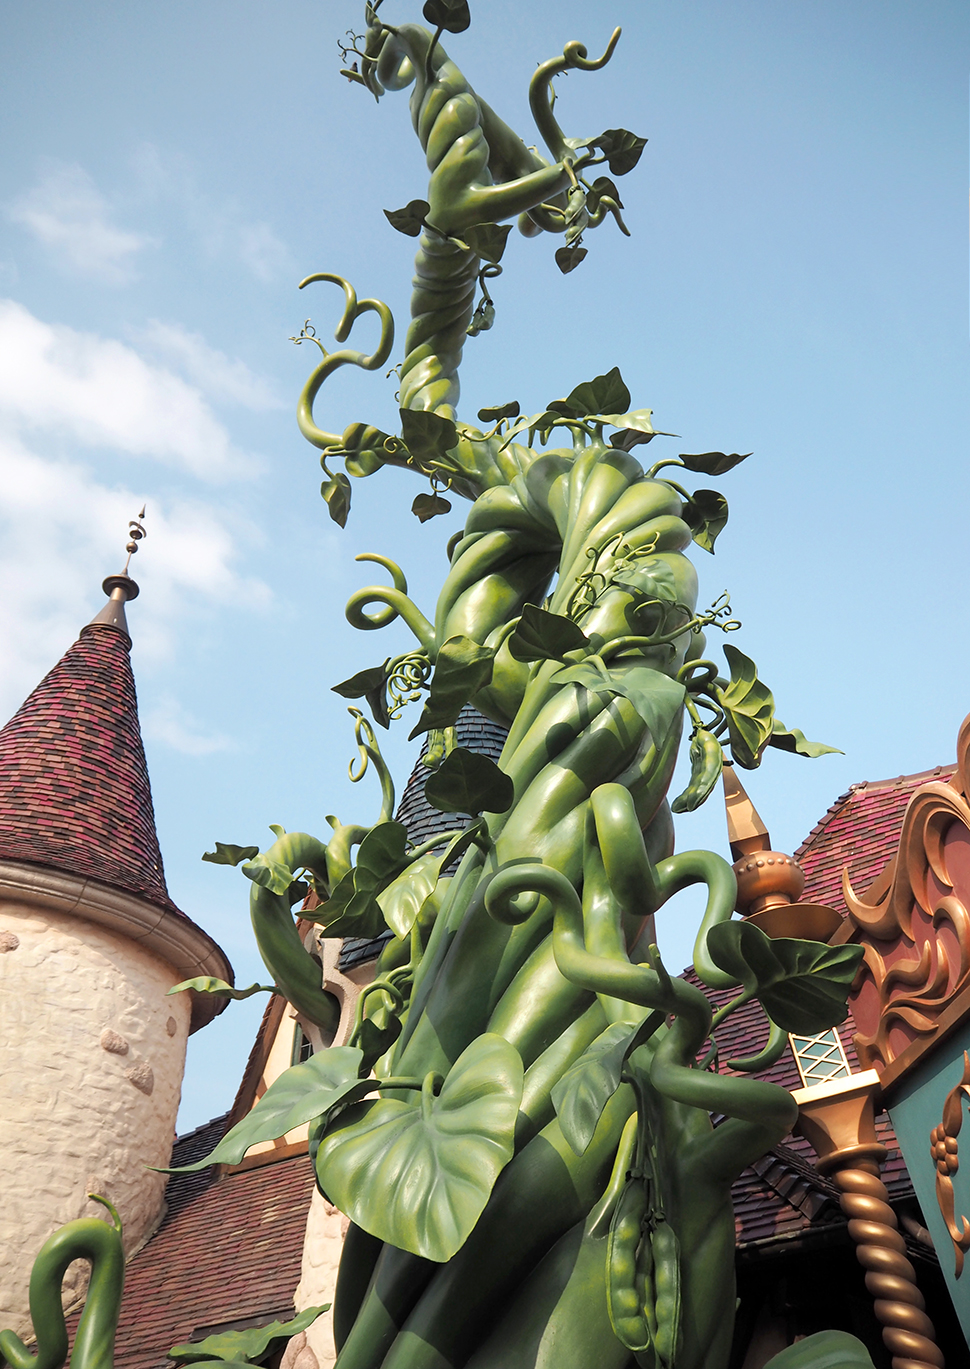 Helloitsvalentine_Disneyland_Spring_37